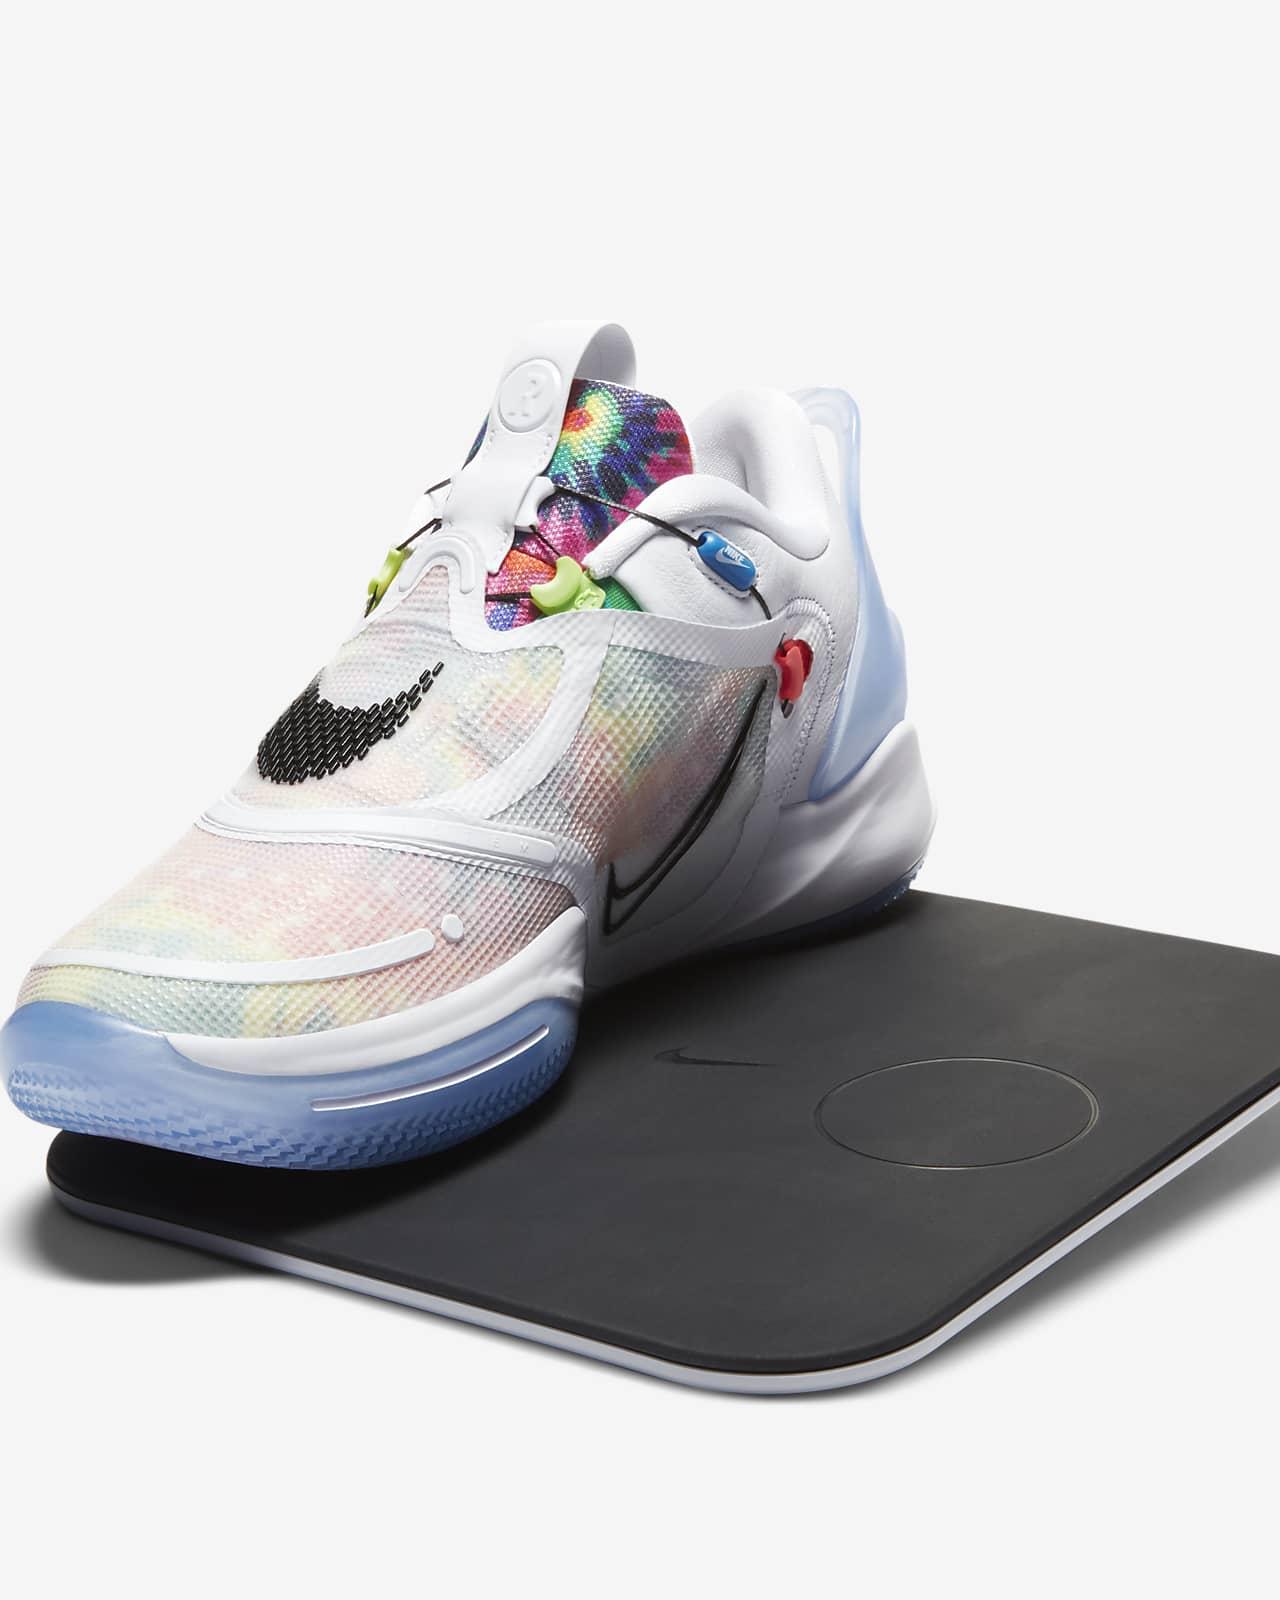 Chaussure de basketball Nike Adapt BB 2.0 « Tie Dye »